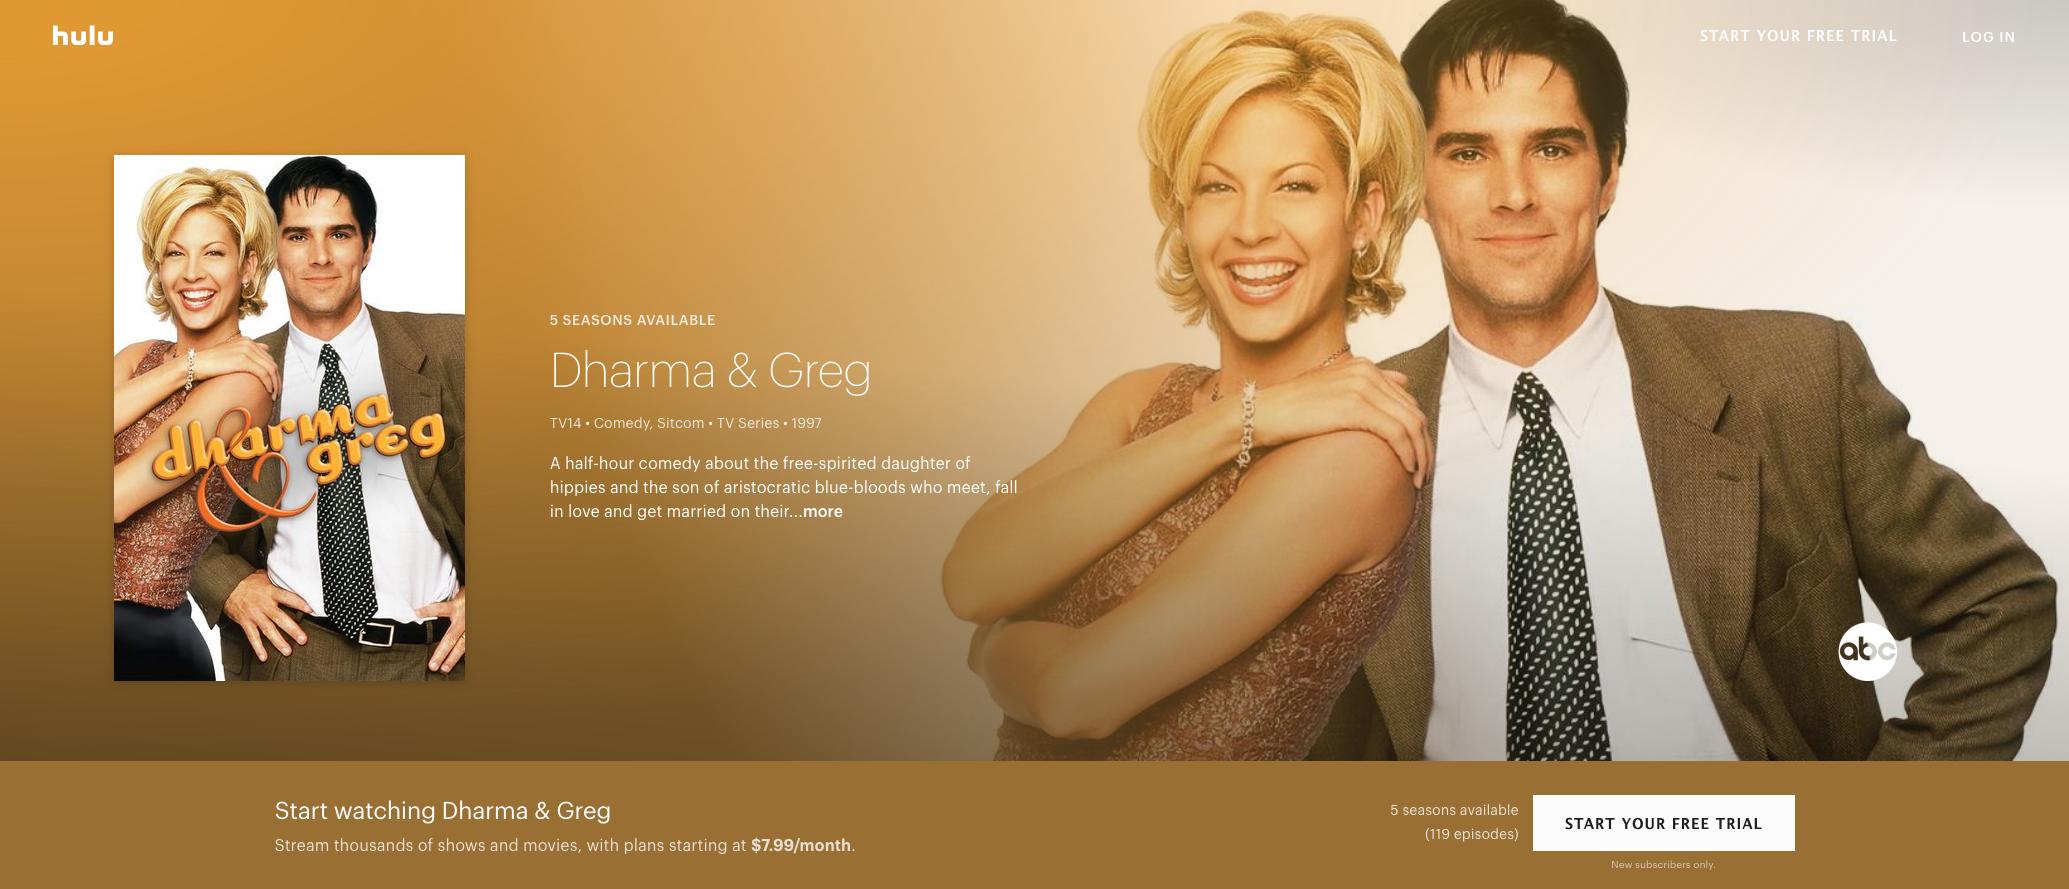 D&G on Hulu.png